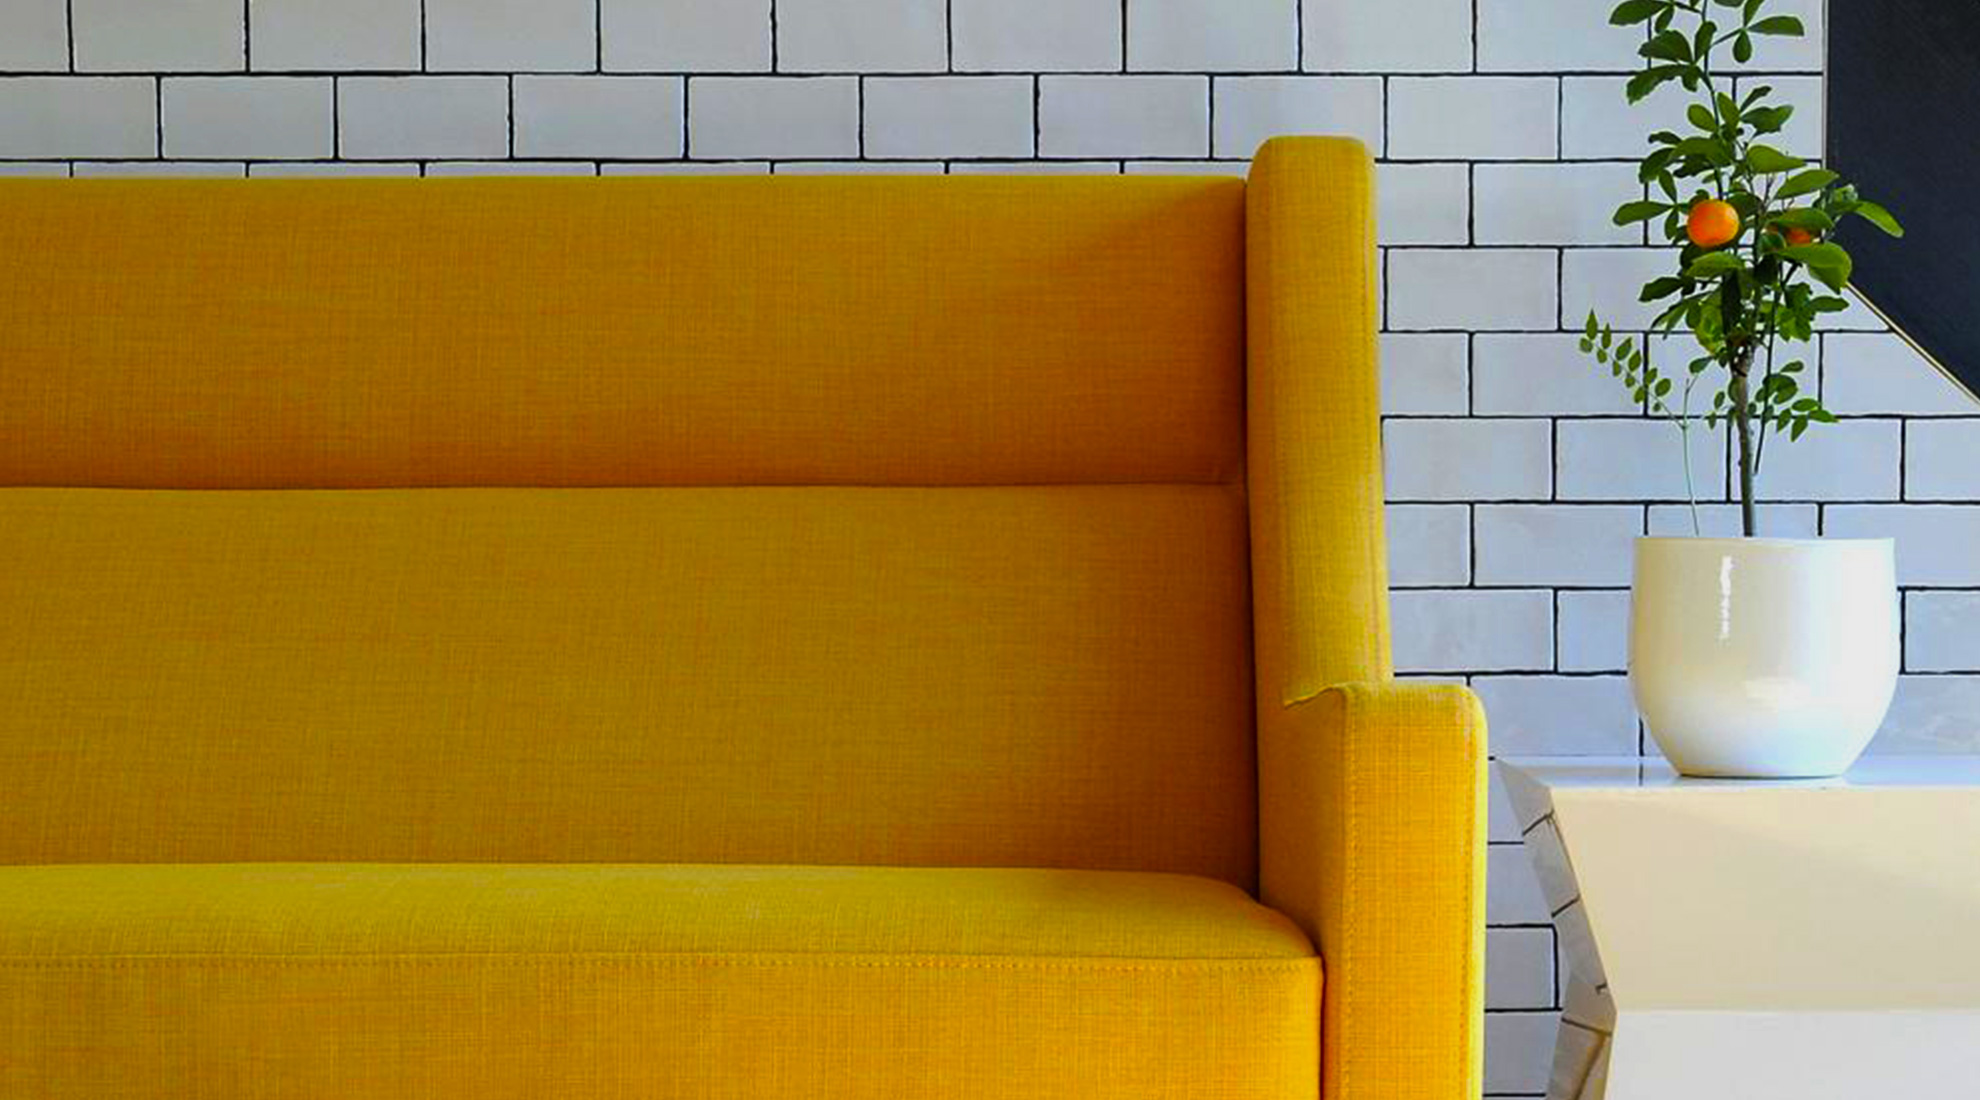 Living Room Design Ideas | 3 Living Room Design Tips at Lumens.com